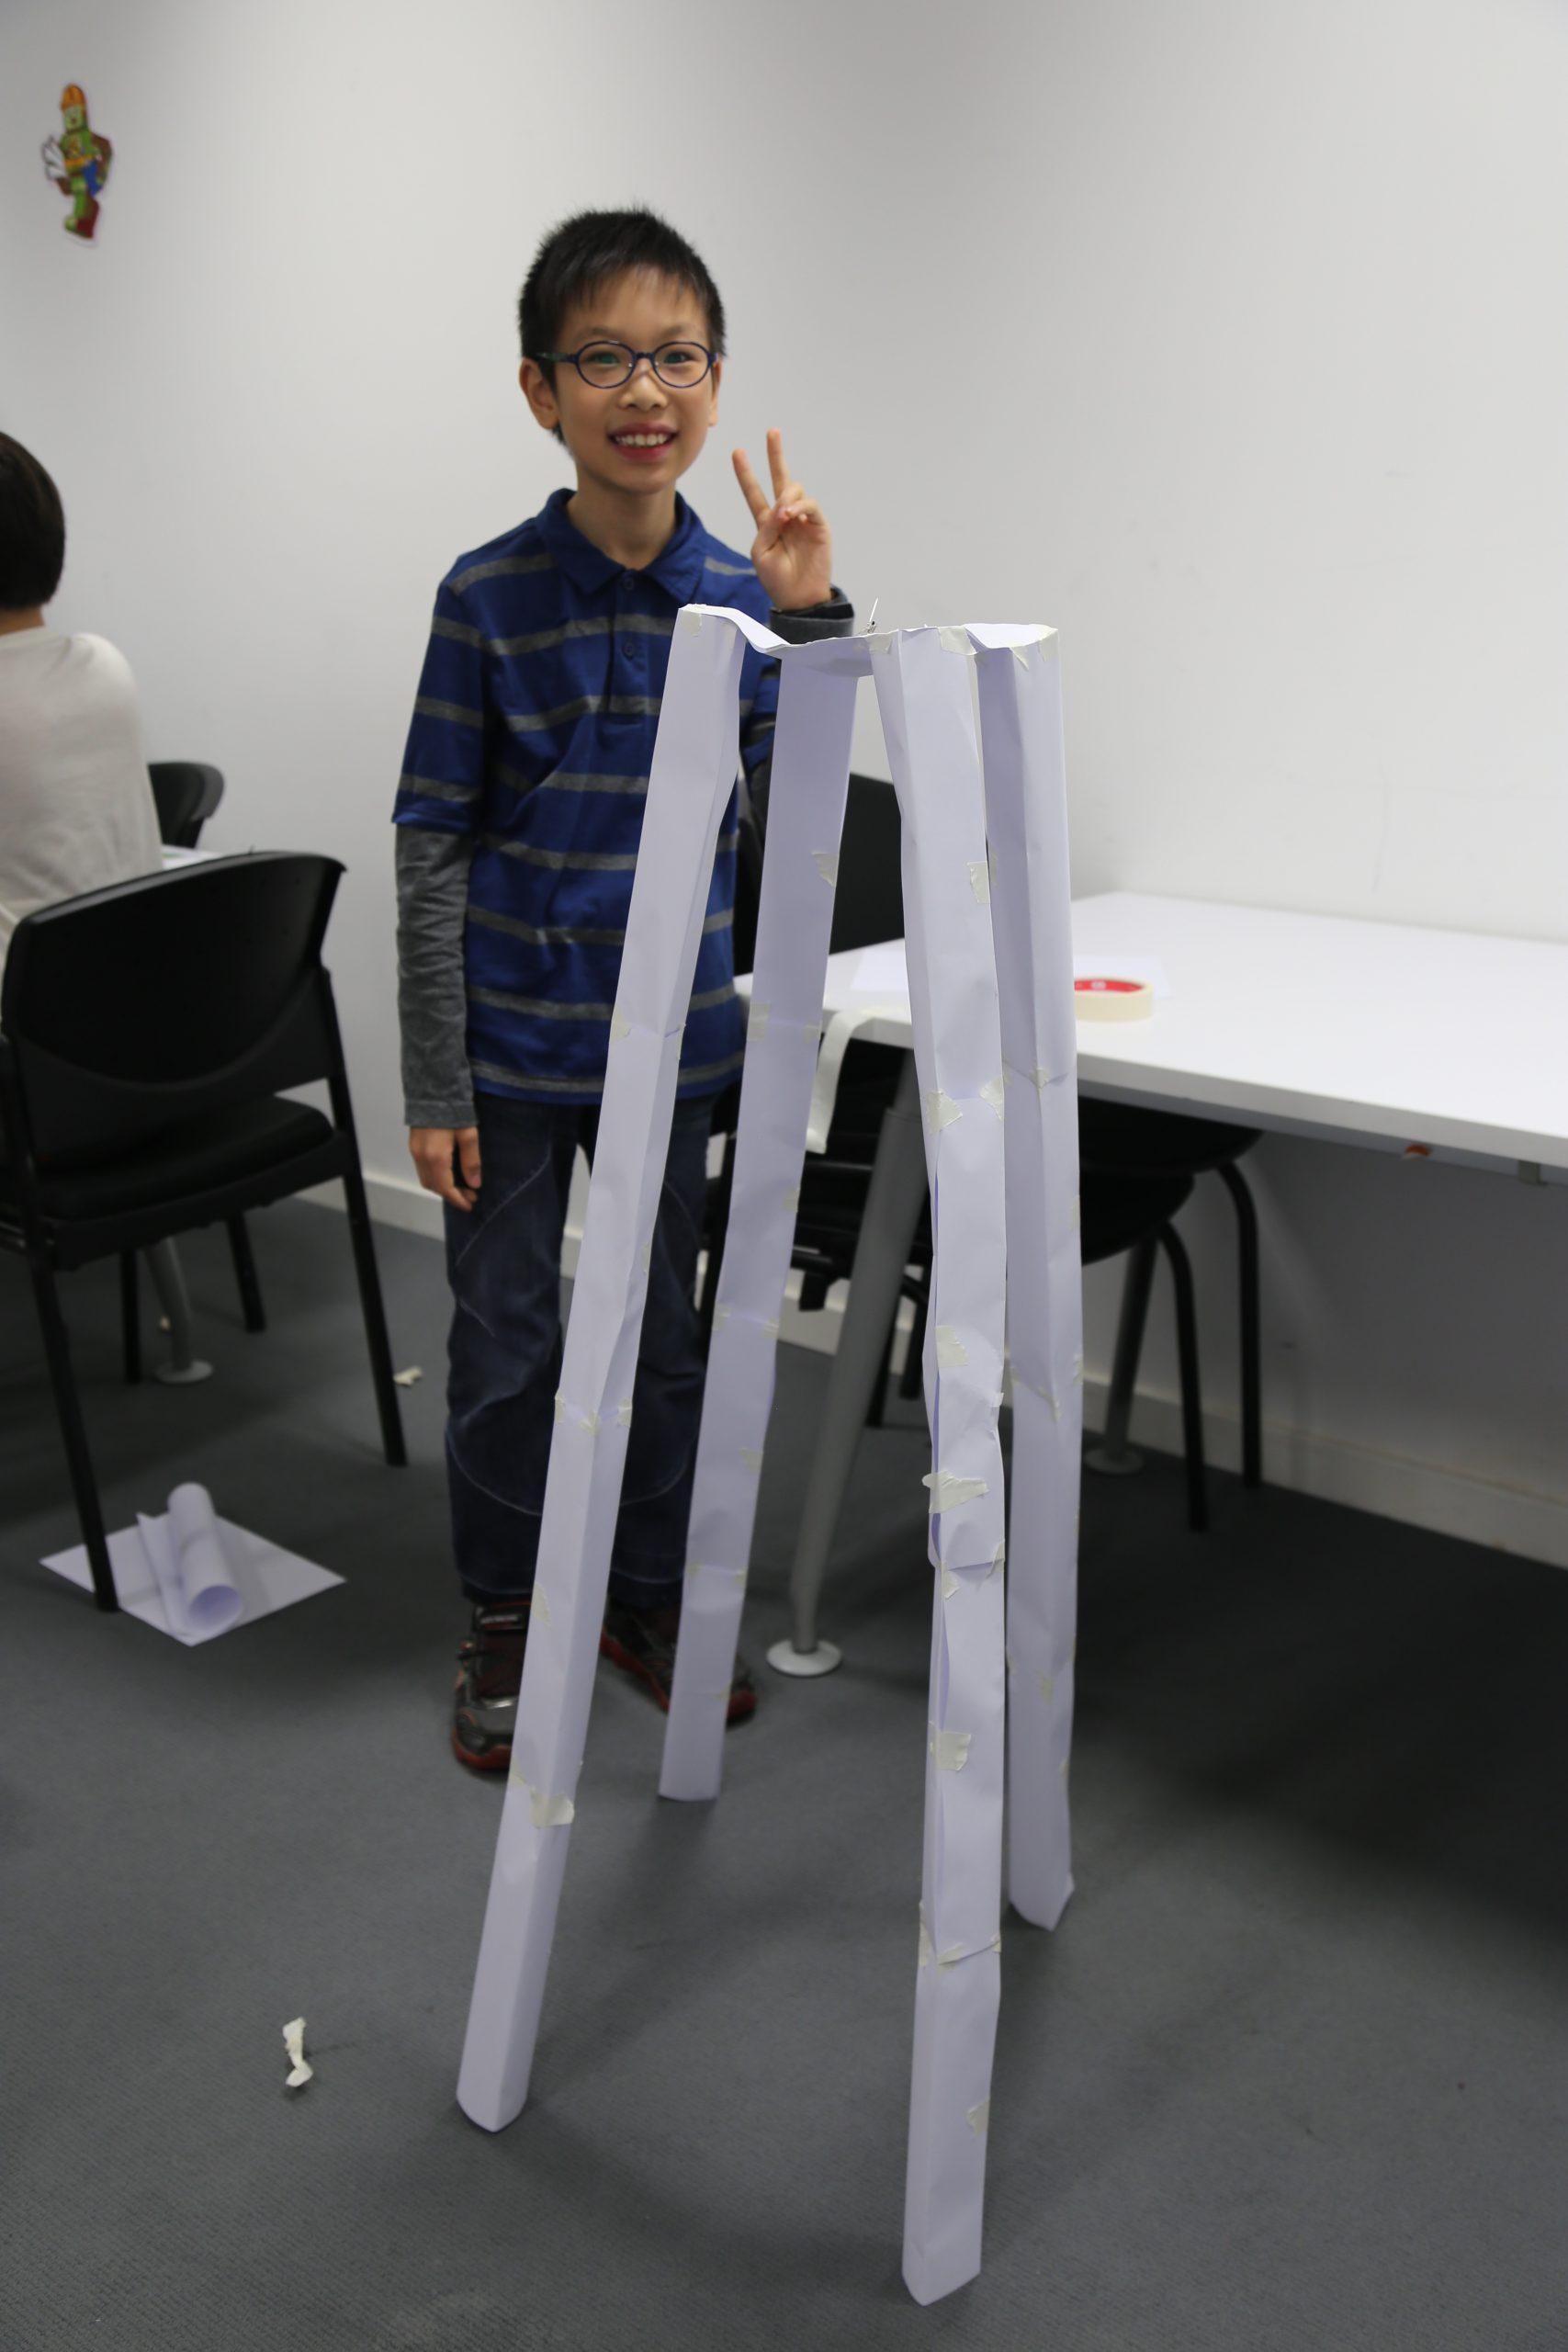 A-Civil Foundation-design-load-creative-excting-paper